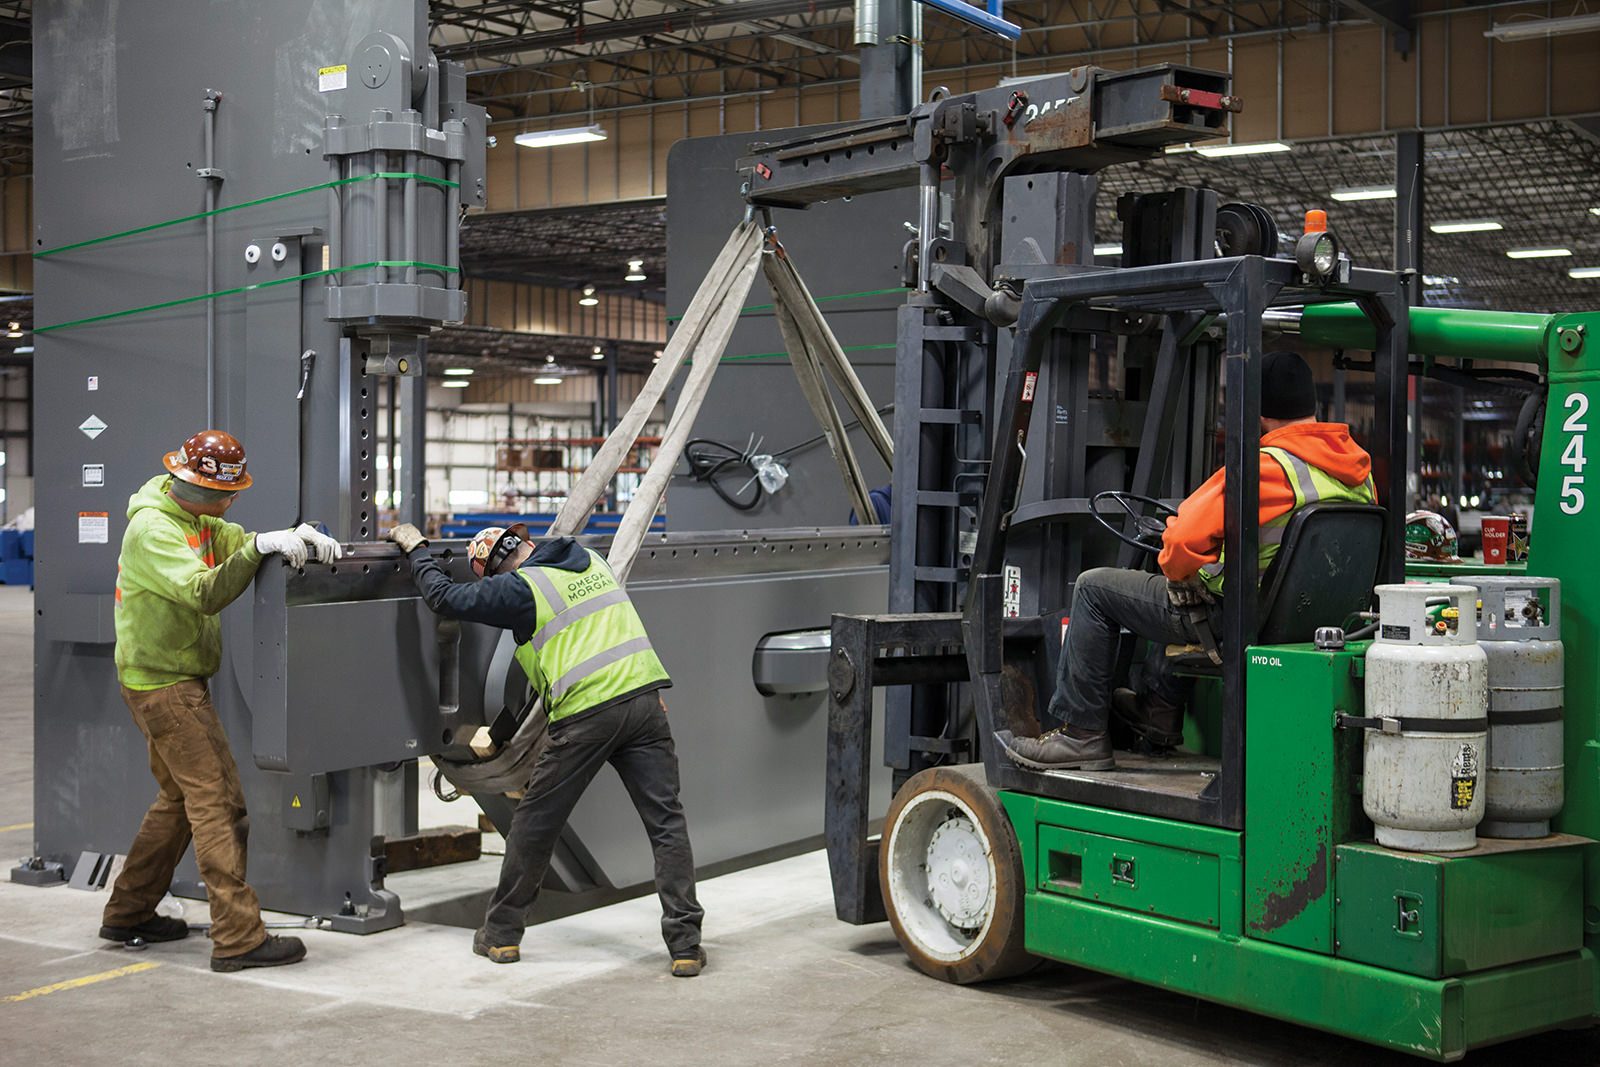 Installing press brake at new manufacturing facility